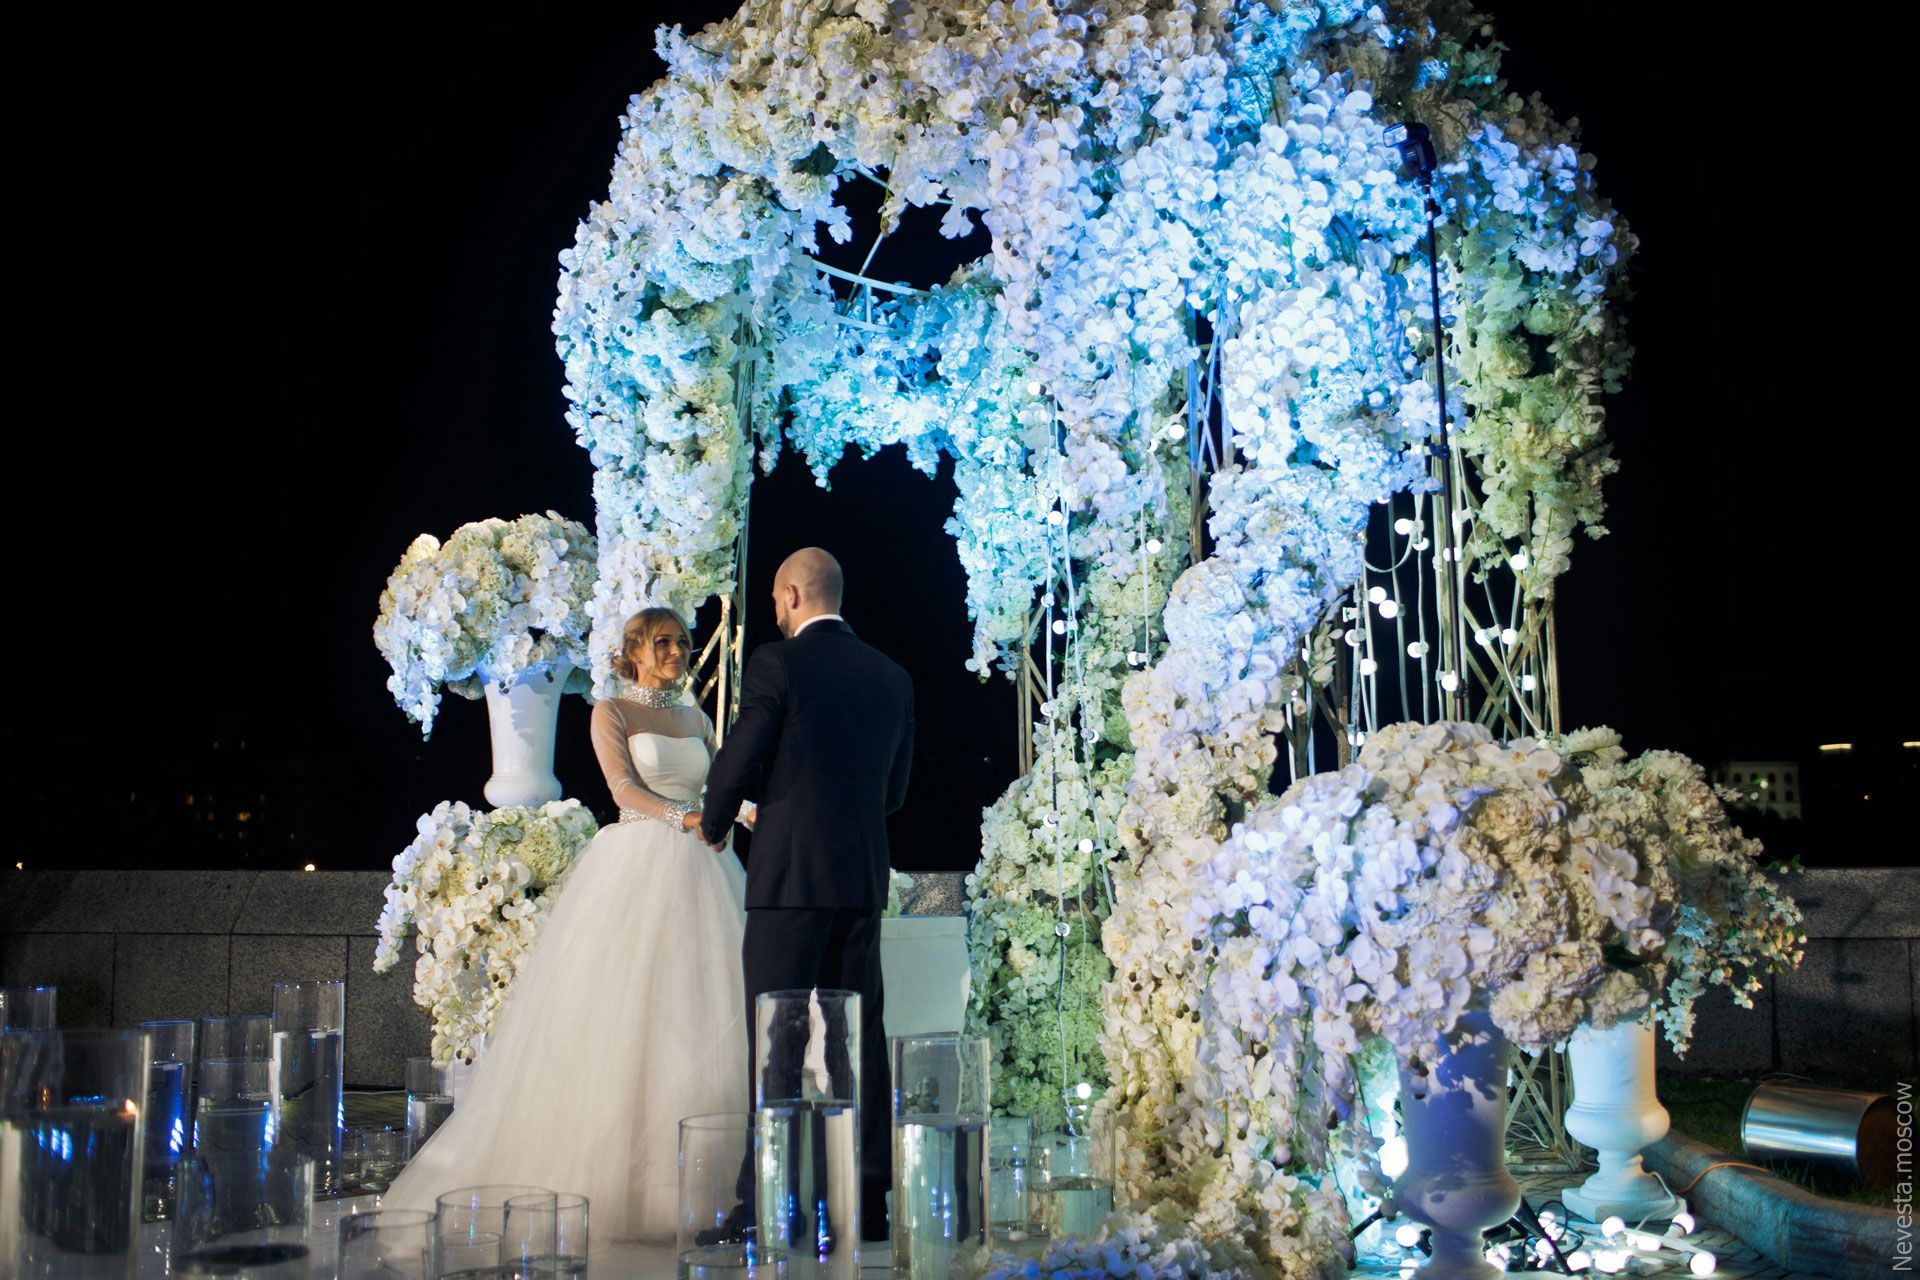 Свадьба Анны Хилькевич и Артура Волкова, фото 15